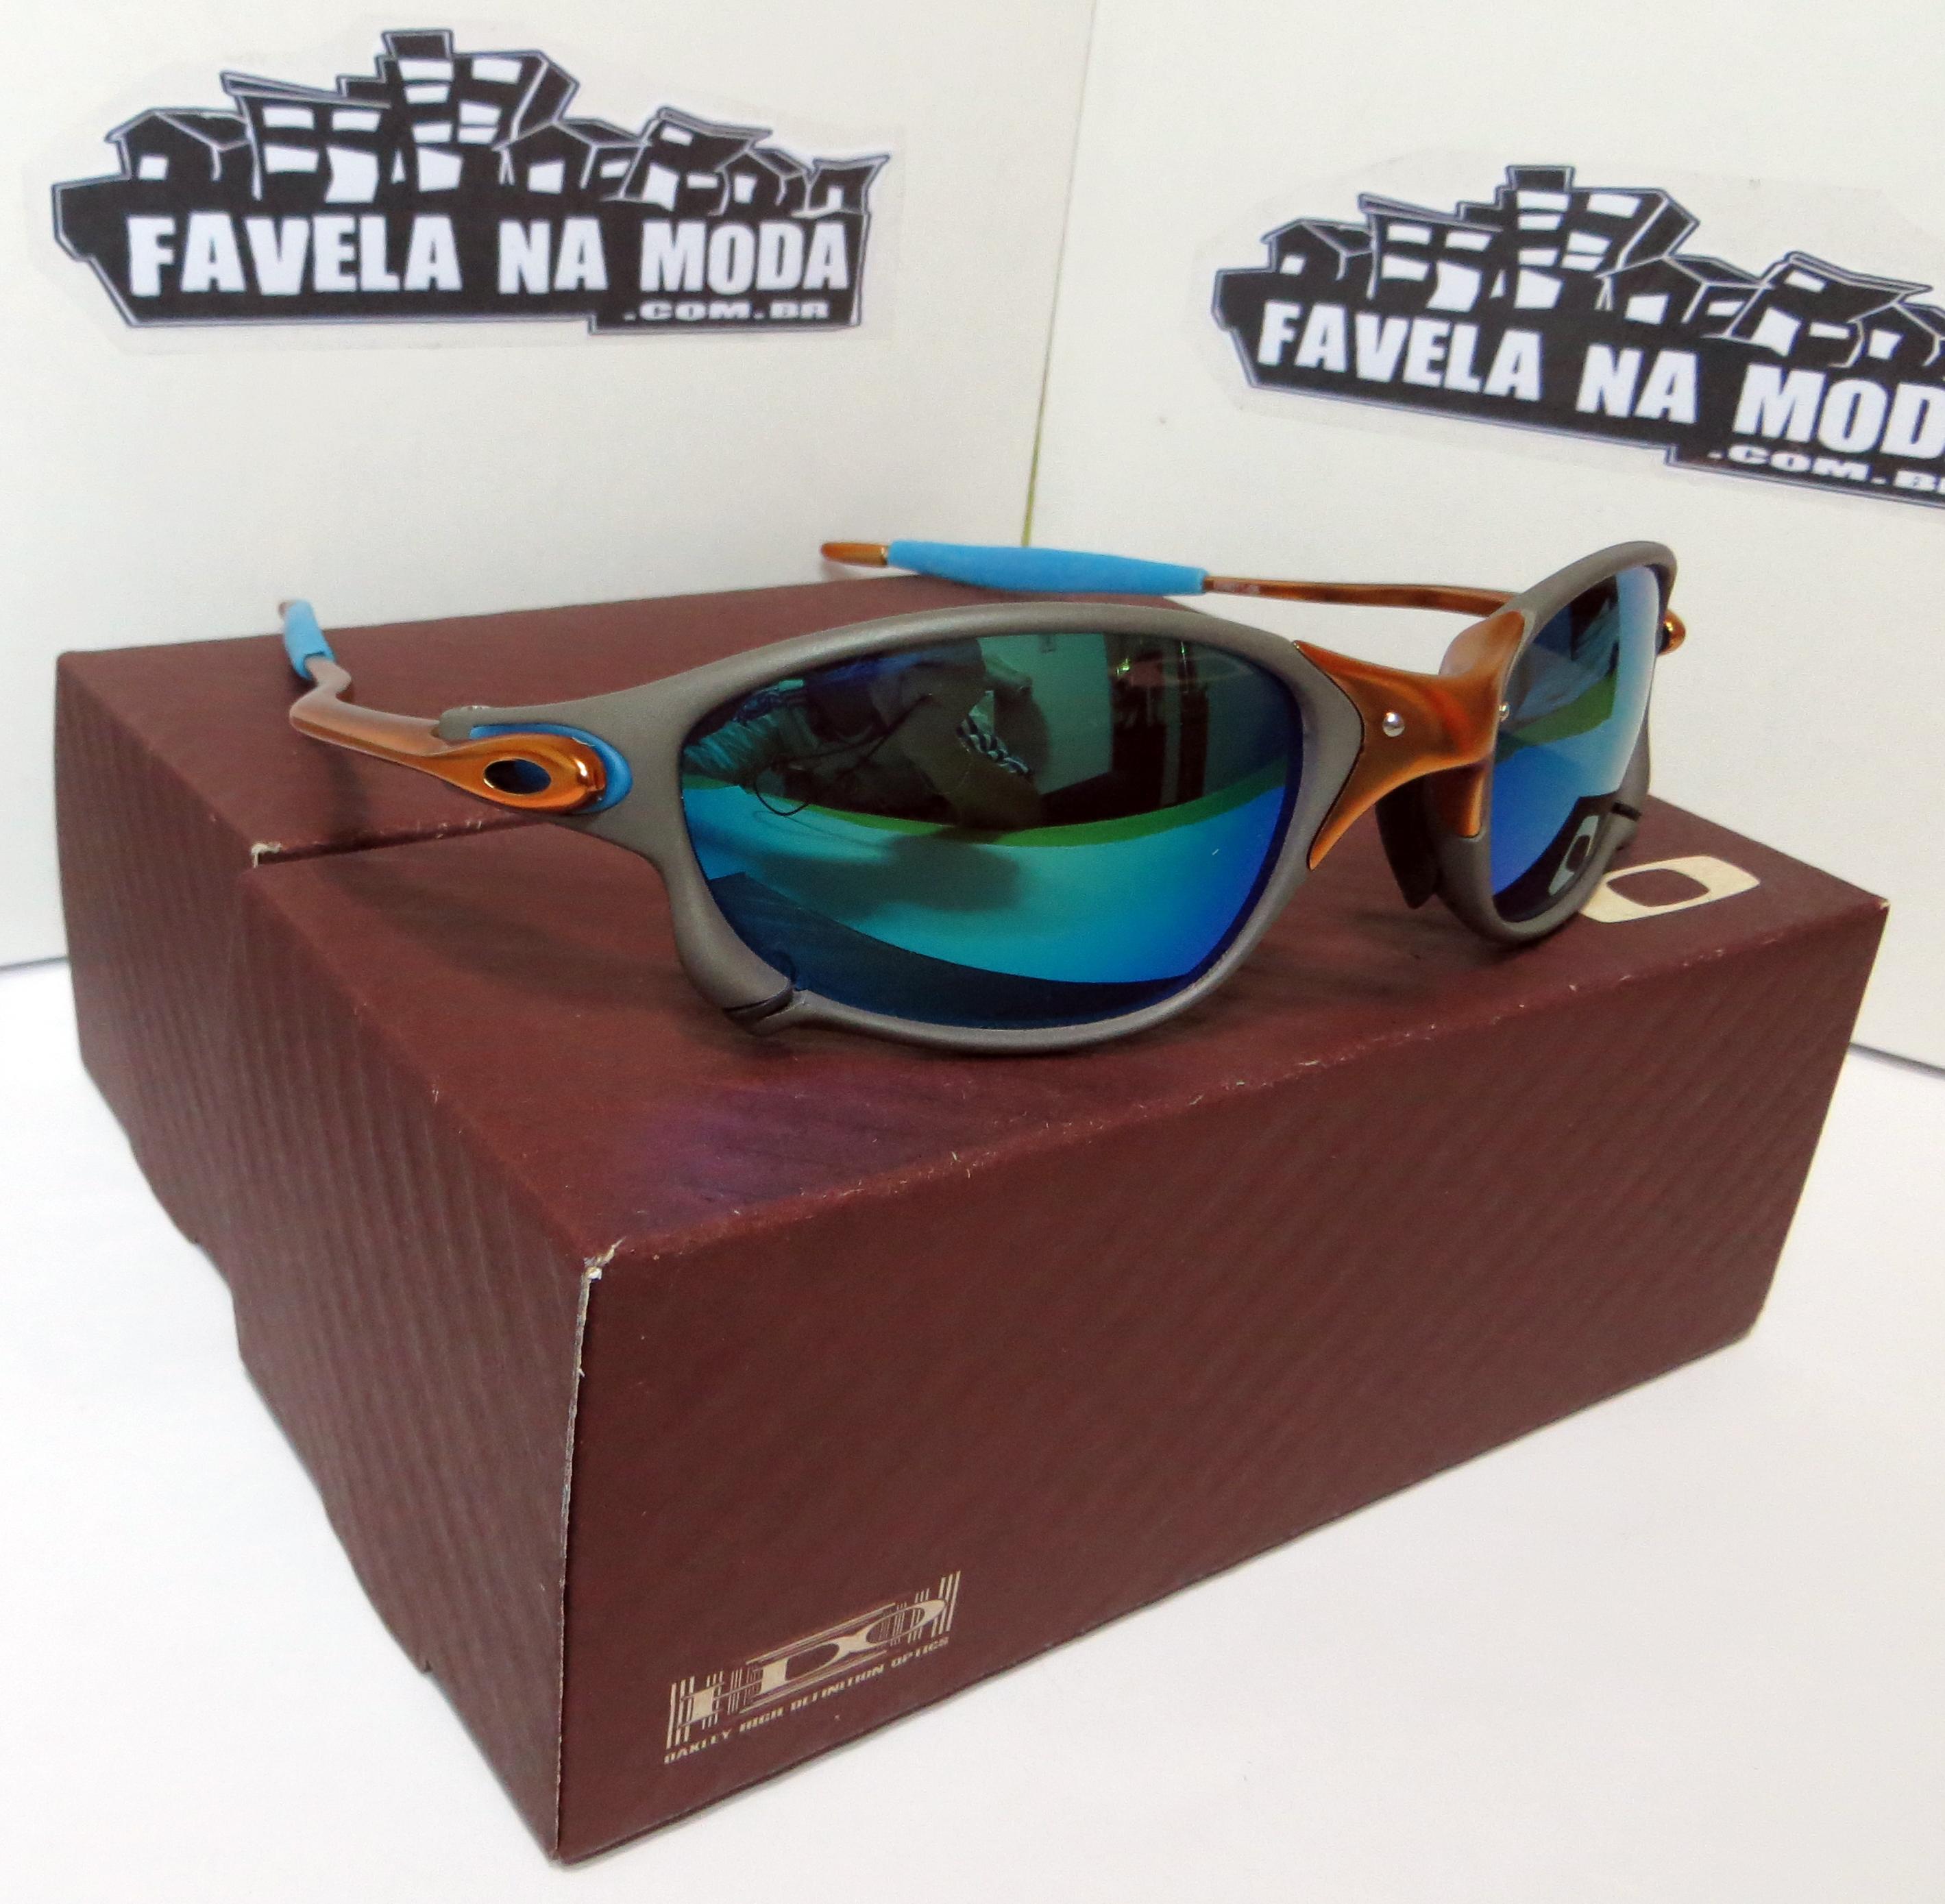 5b8fb03d51fb4 Óculos Oakley Double xx - 24k   Green Jade   Borrachas Azul Bebê - Favela  na Moda Imports